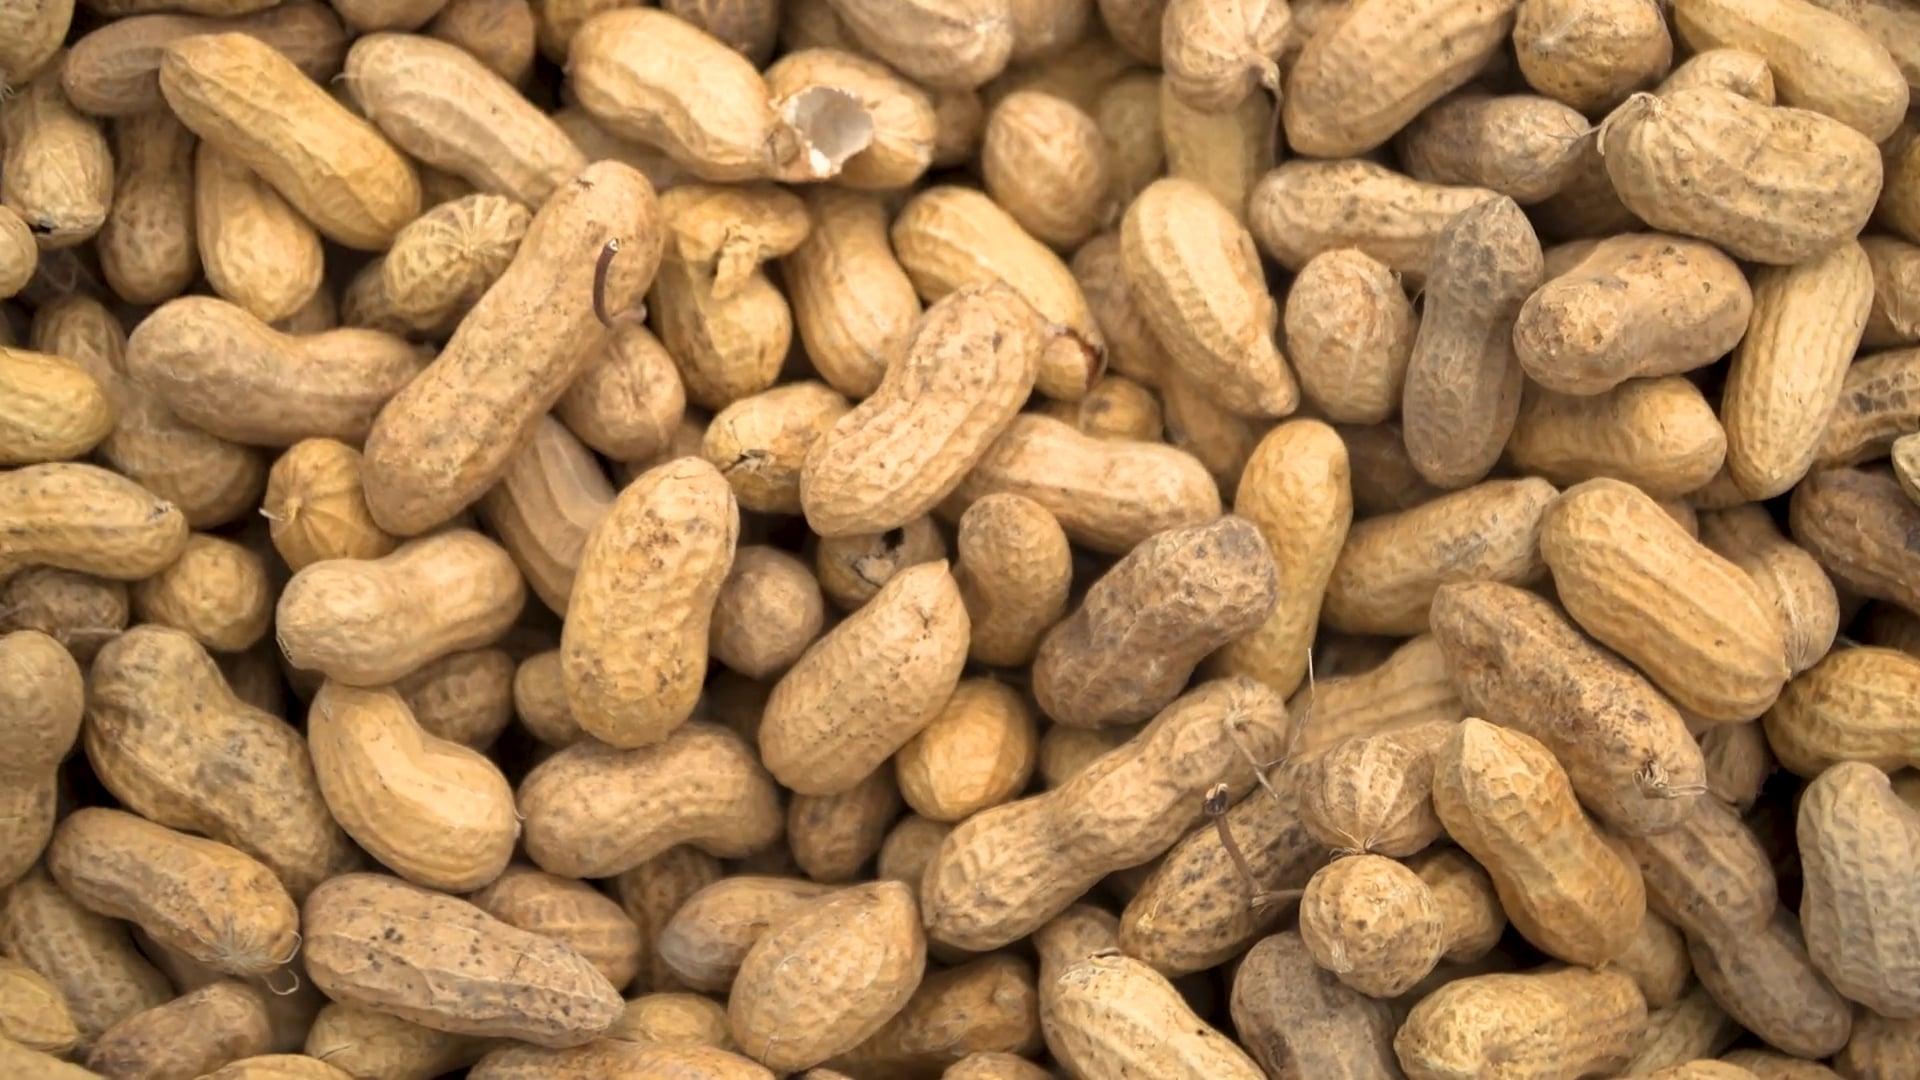 North Carolina Peanuts